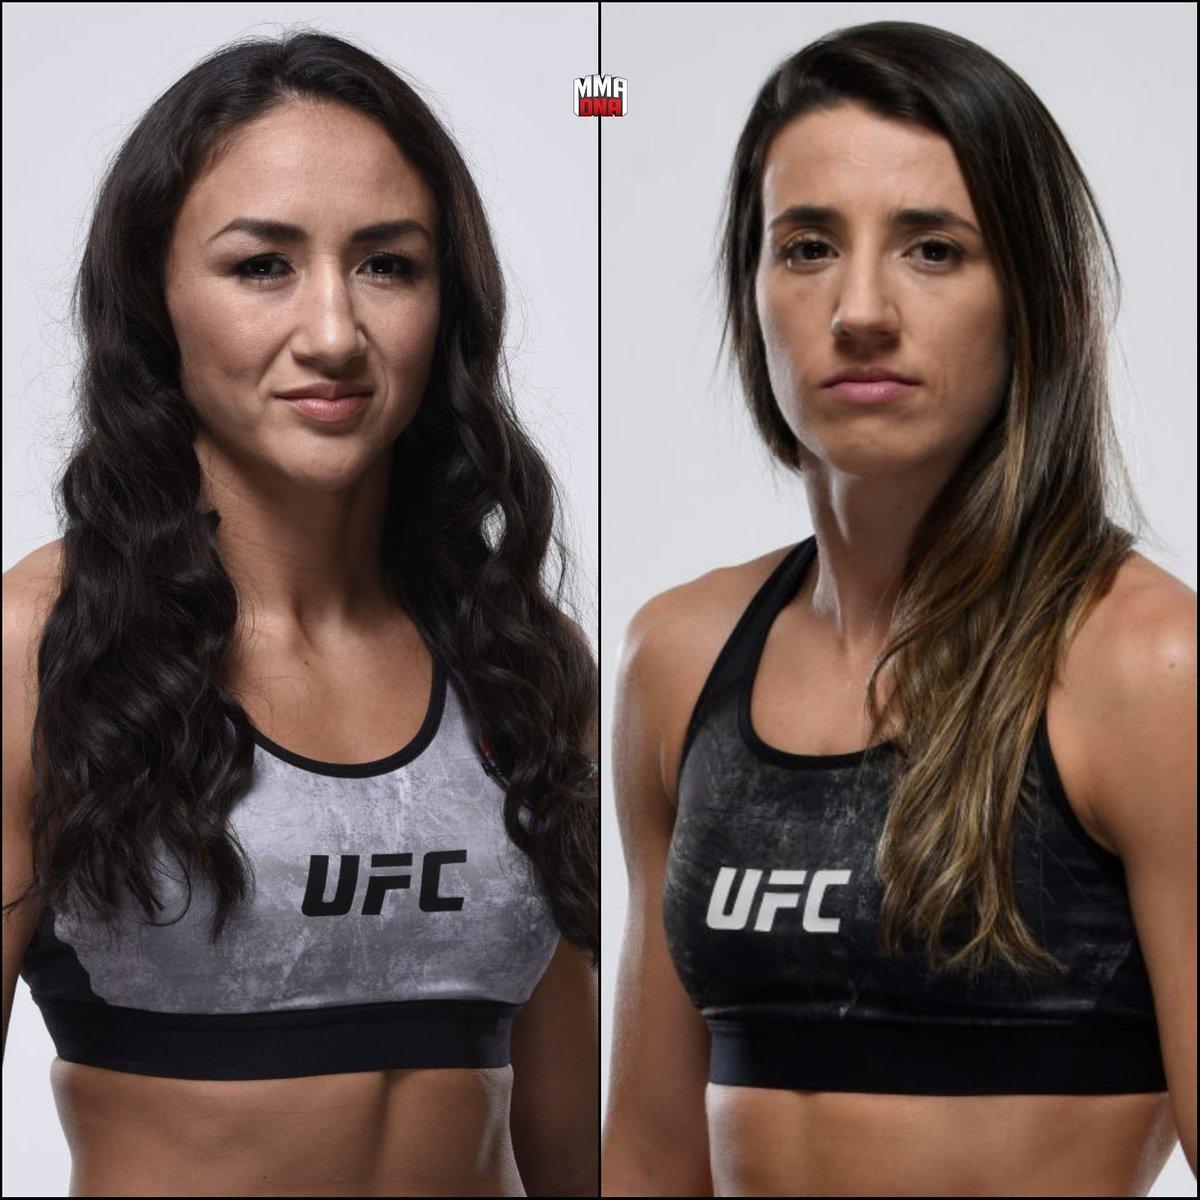 Carla Esparza will fight Marina Rodriguez at UFC event on July 25th. (per @MMAFighting) #UFC #MMA #UFCESPN 🏝 https://t.co/Z96L8YakLq